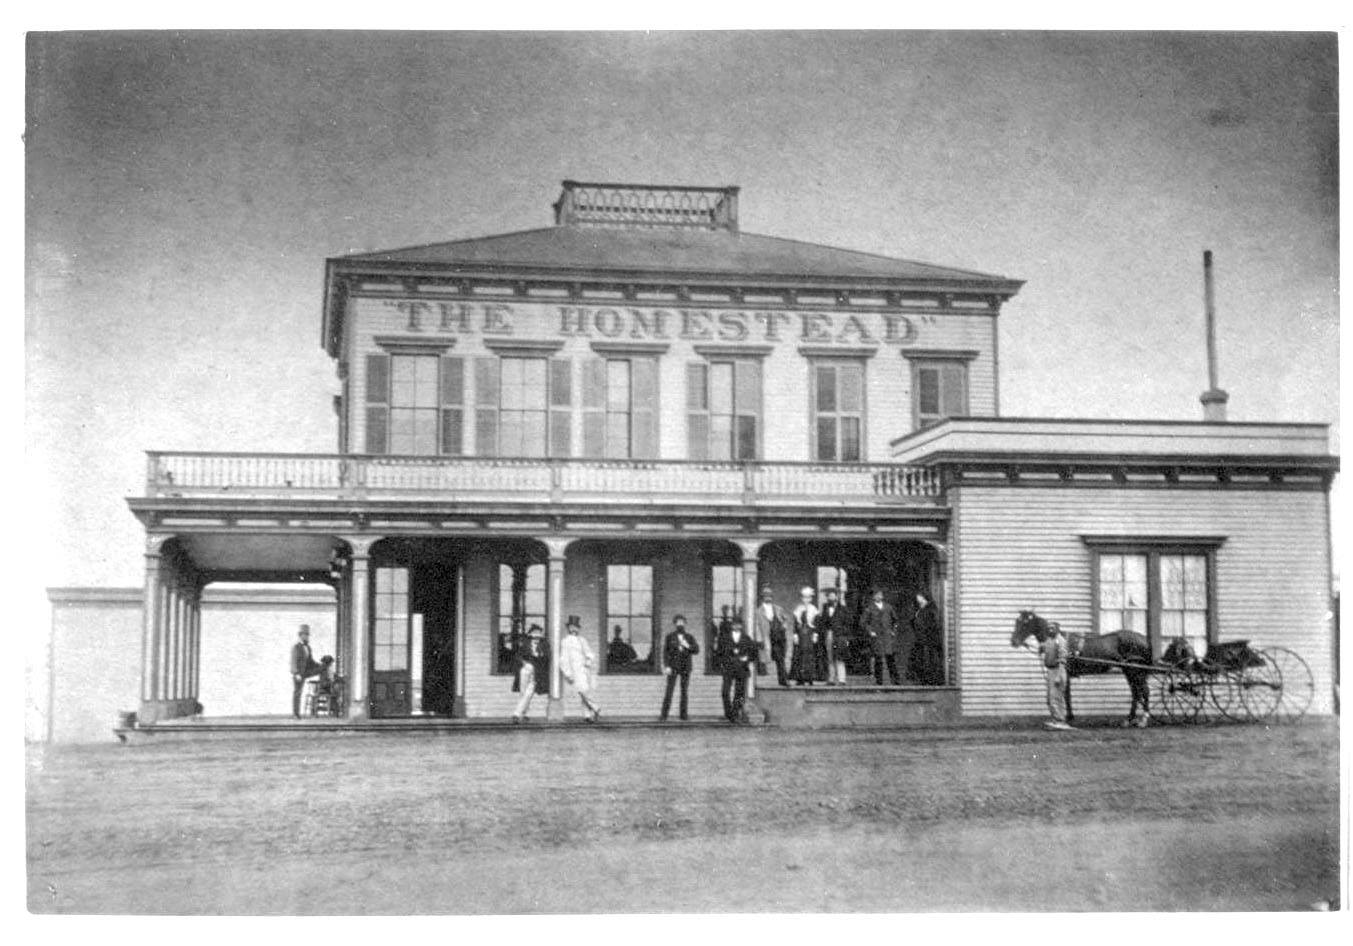 Junius Foster's Homestead at 24th & Geary (Pt Lobos Rd) 1880.jpg